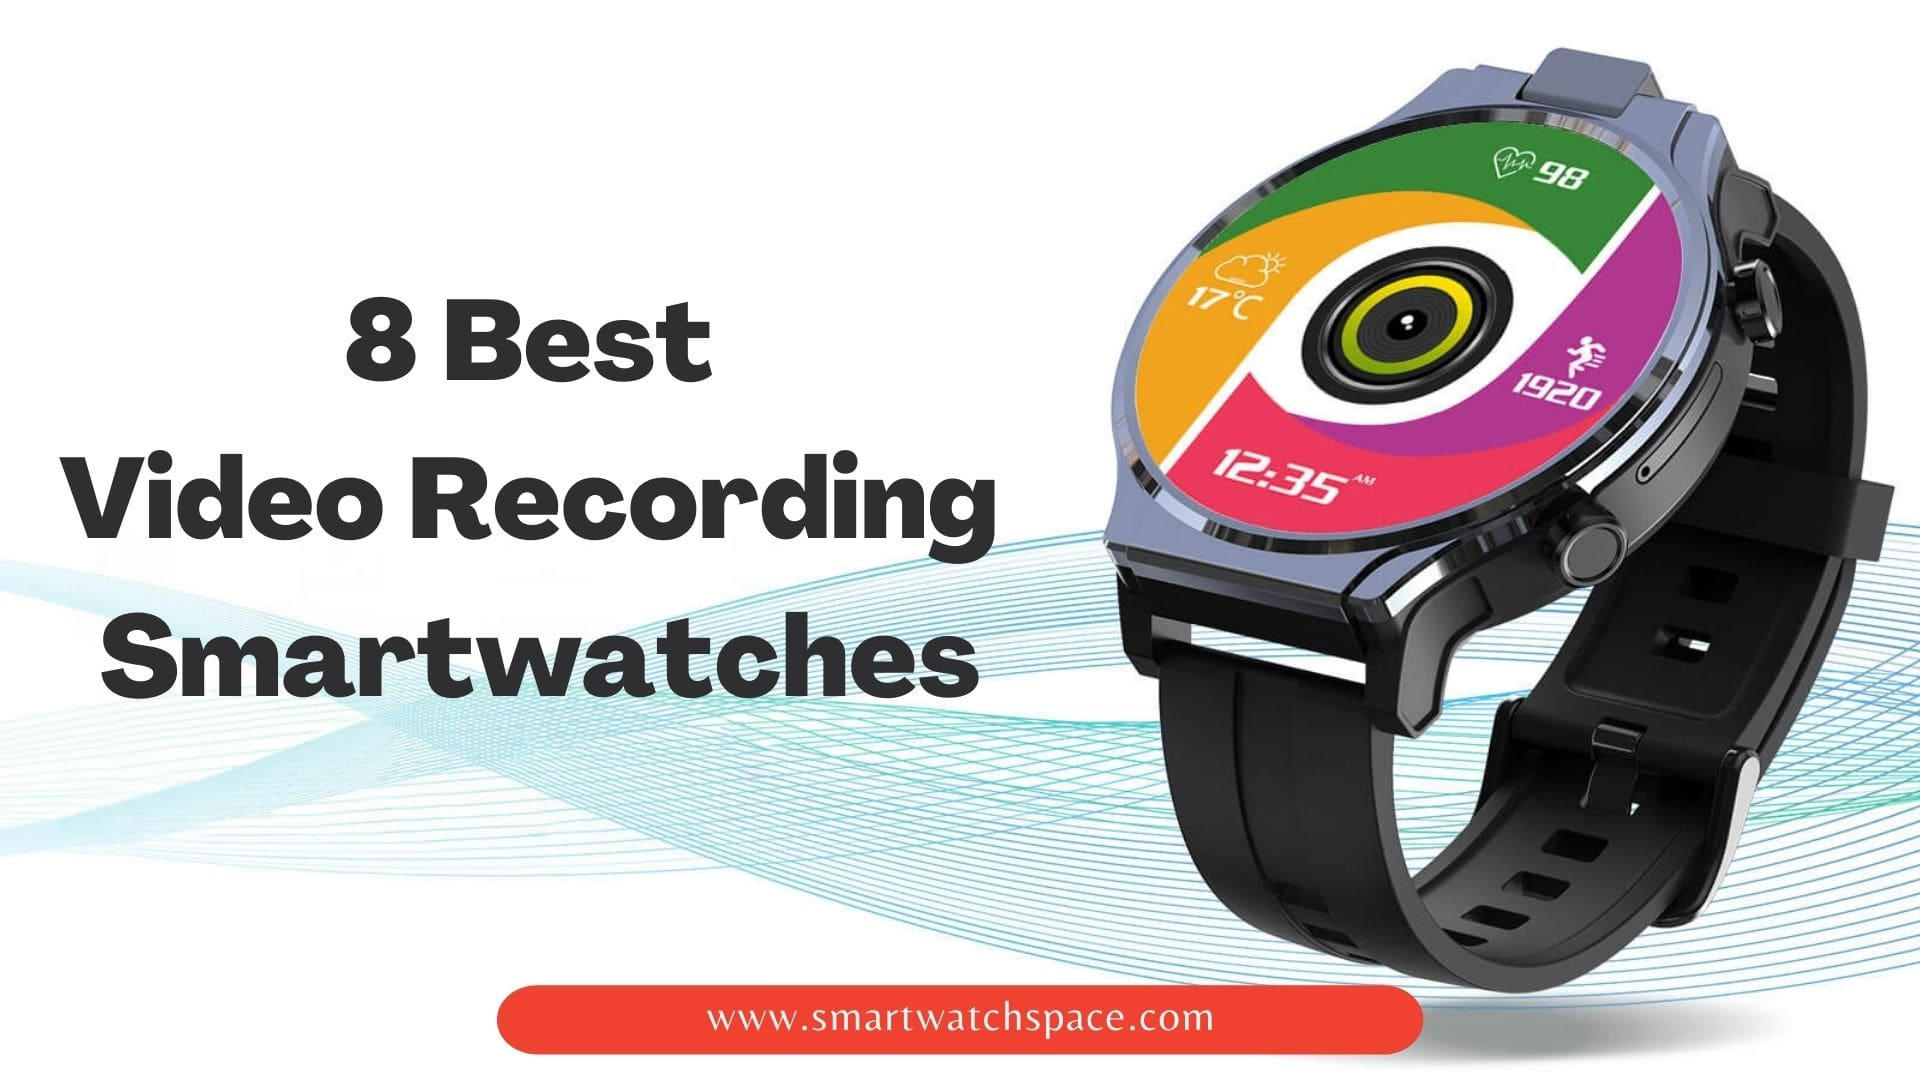 Video Recording smartwatches